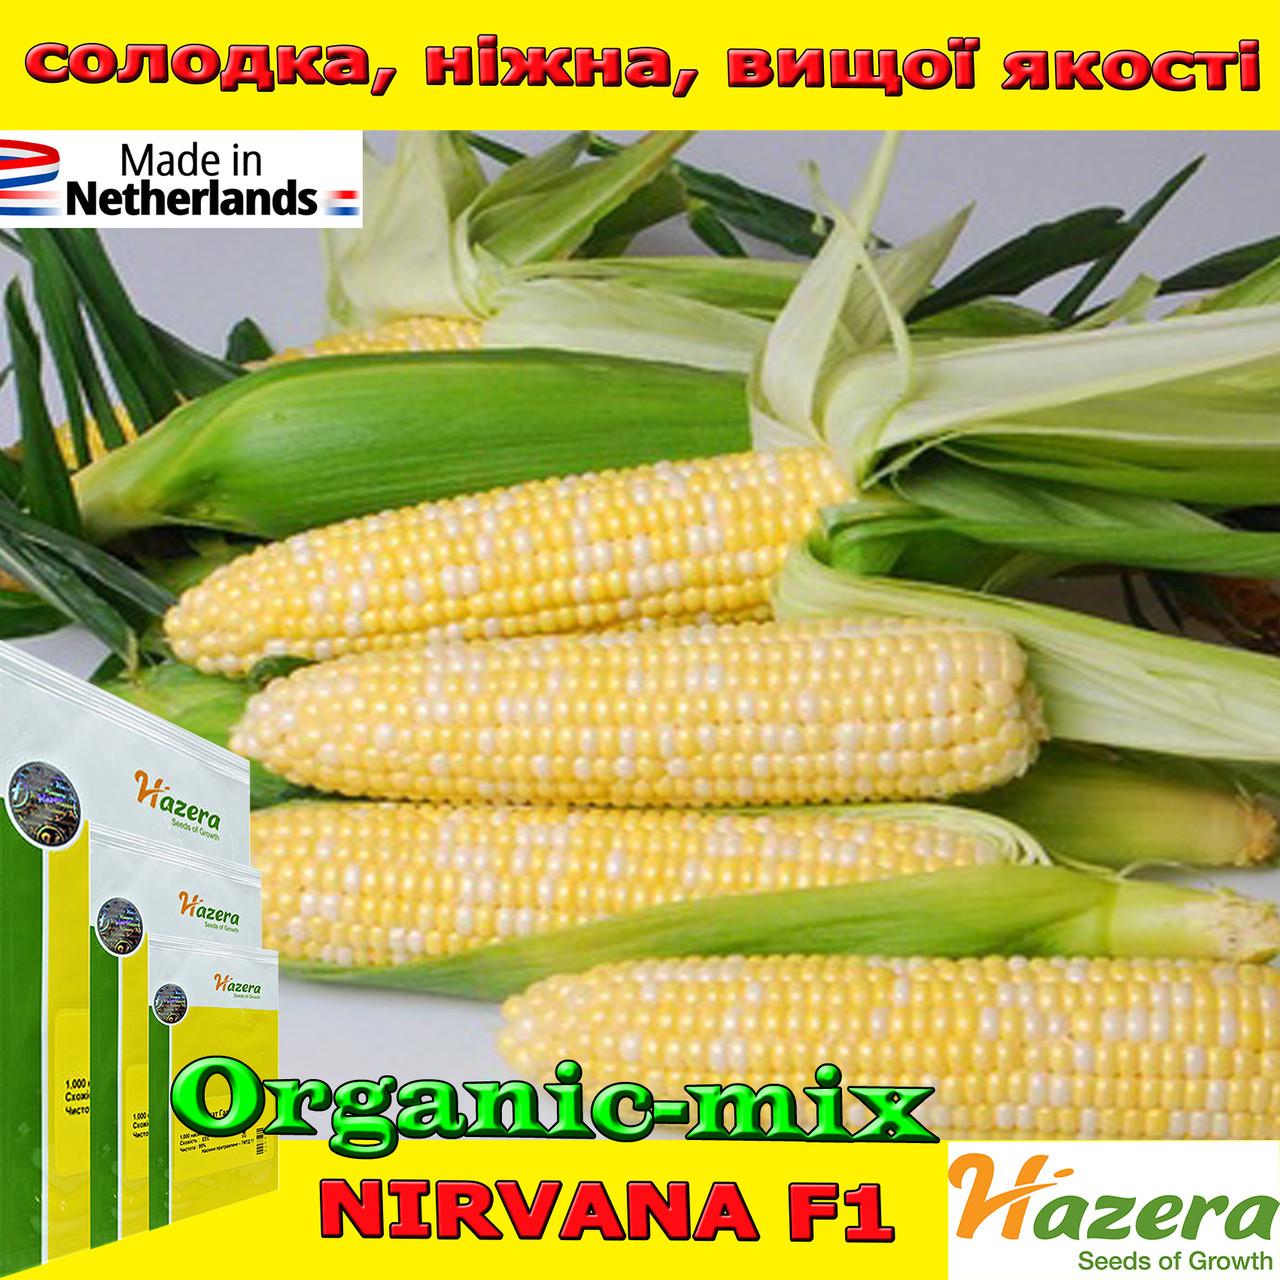 Семена, кукуруза сахарная двухцветная (биколор) Нирвана F1 (Нидерланды), 1000 семян, ТМ Hazera Seeds